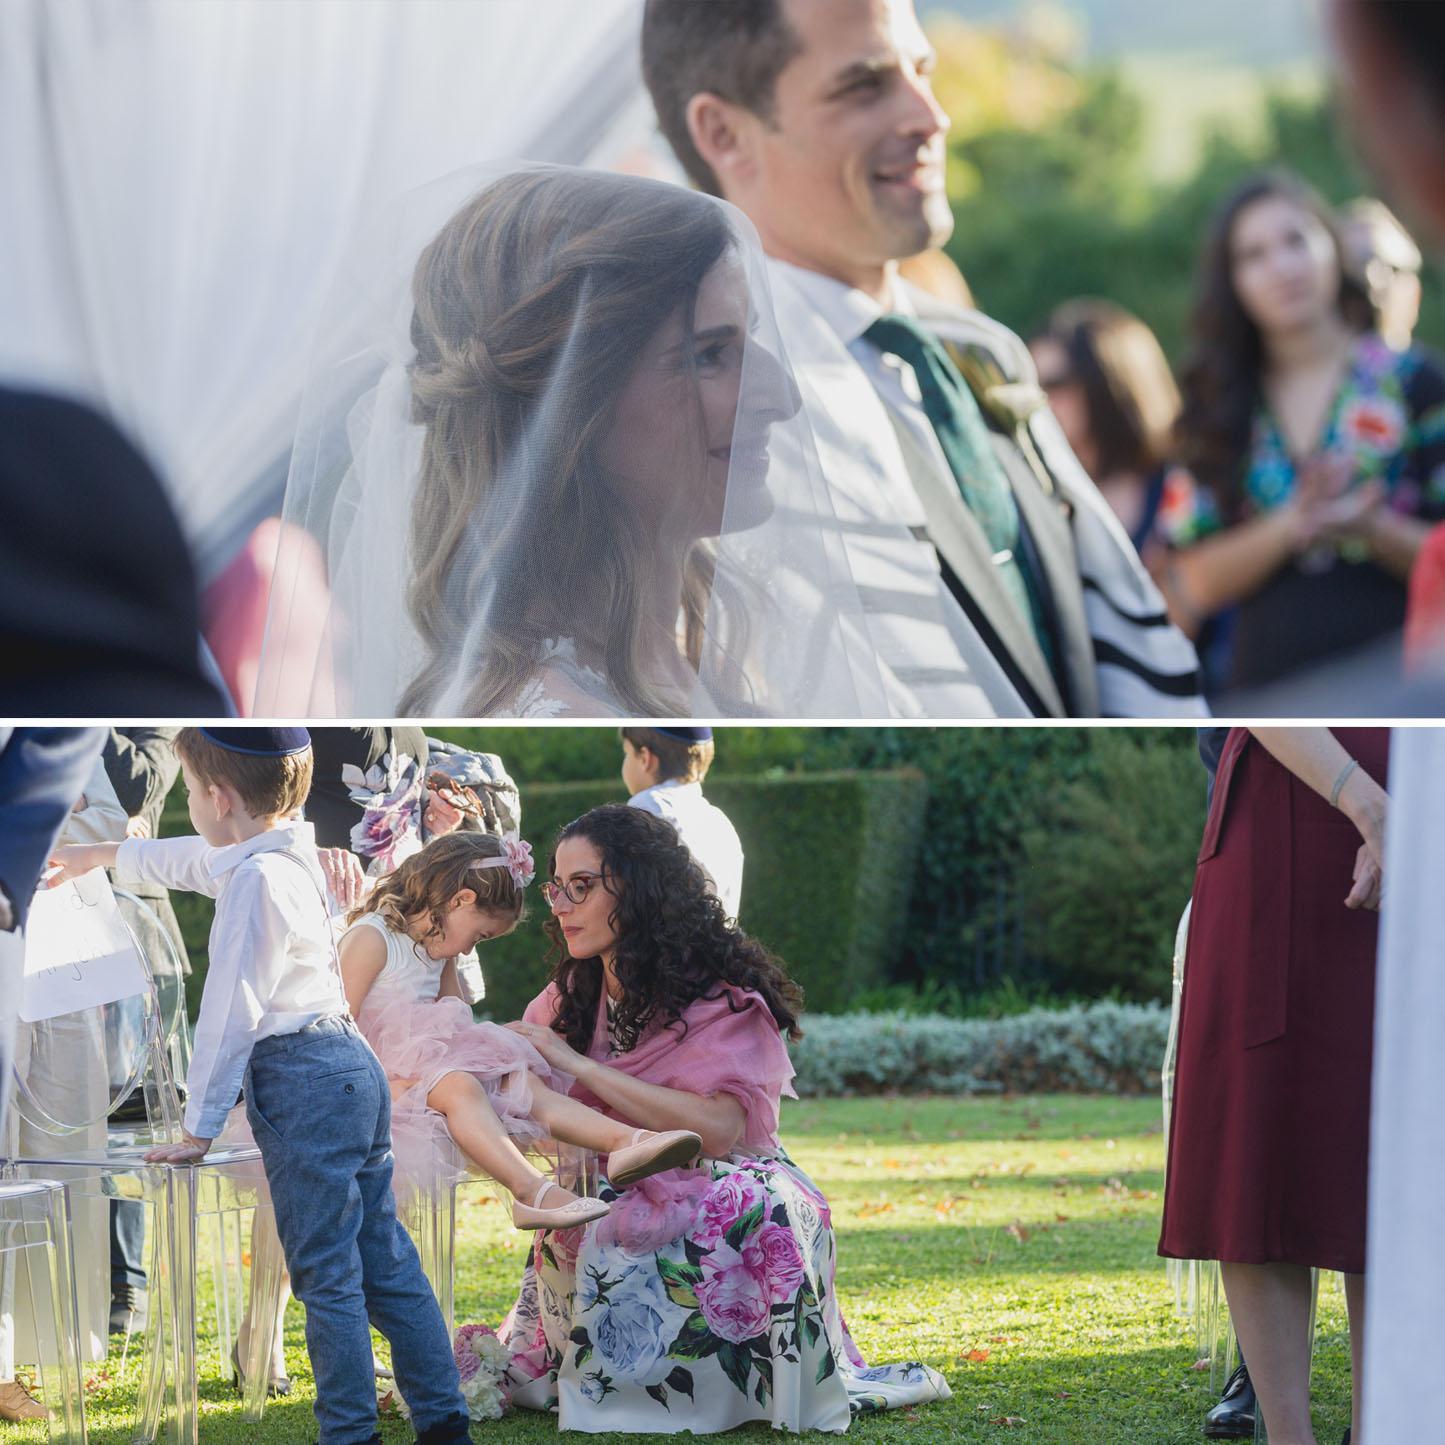 Leon_&_Martine's_Wedding_Photographs_17th_April_2019_@johnhenryweddingphoto_Low_Resolution_Web-316-1.jpg